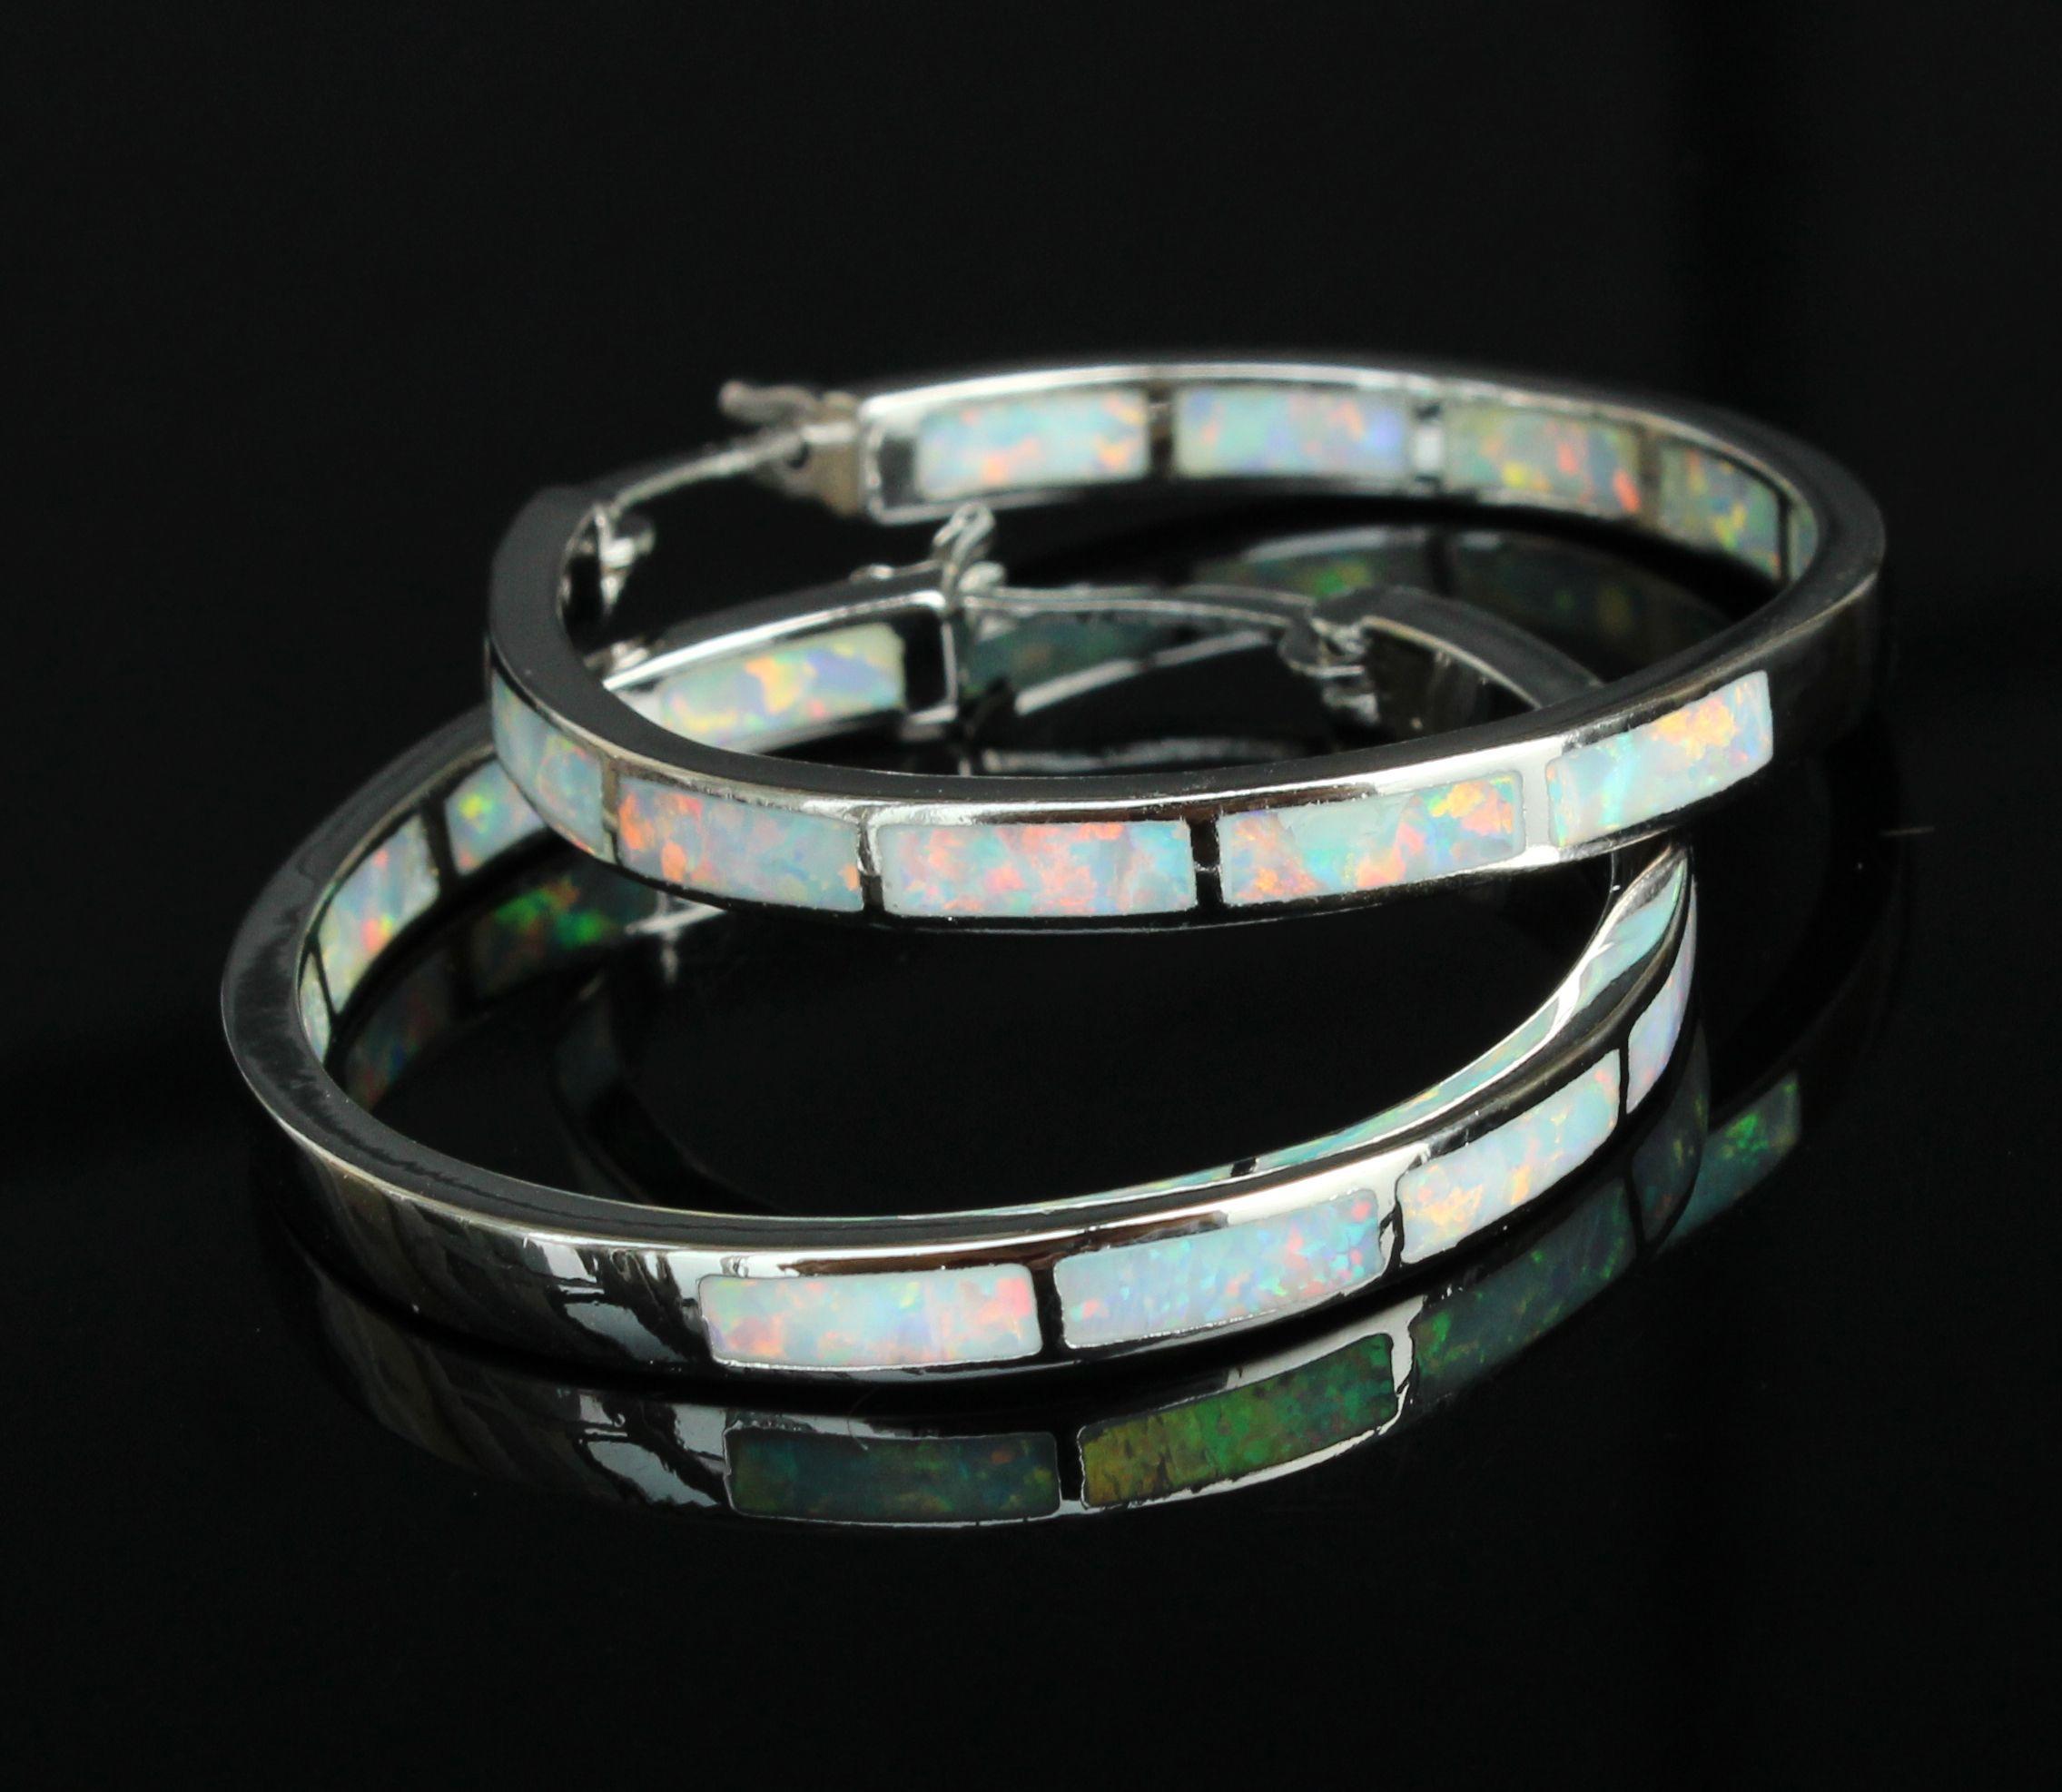 2018 charming large blue white fire opal hoop earrings for